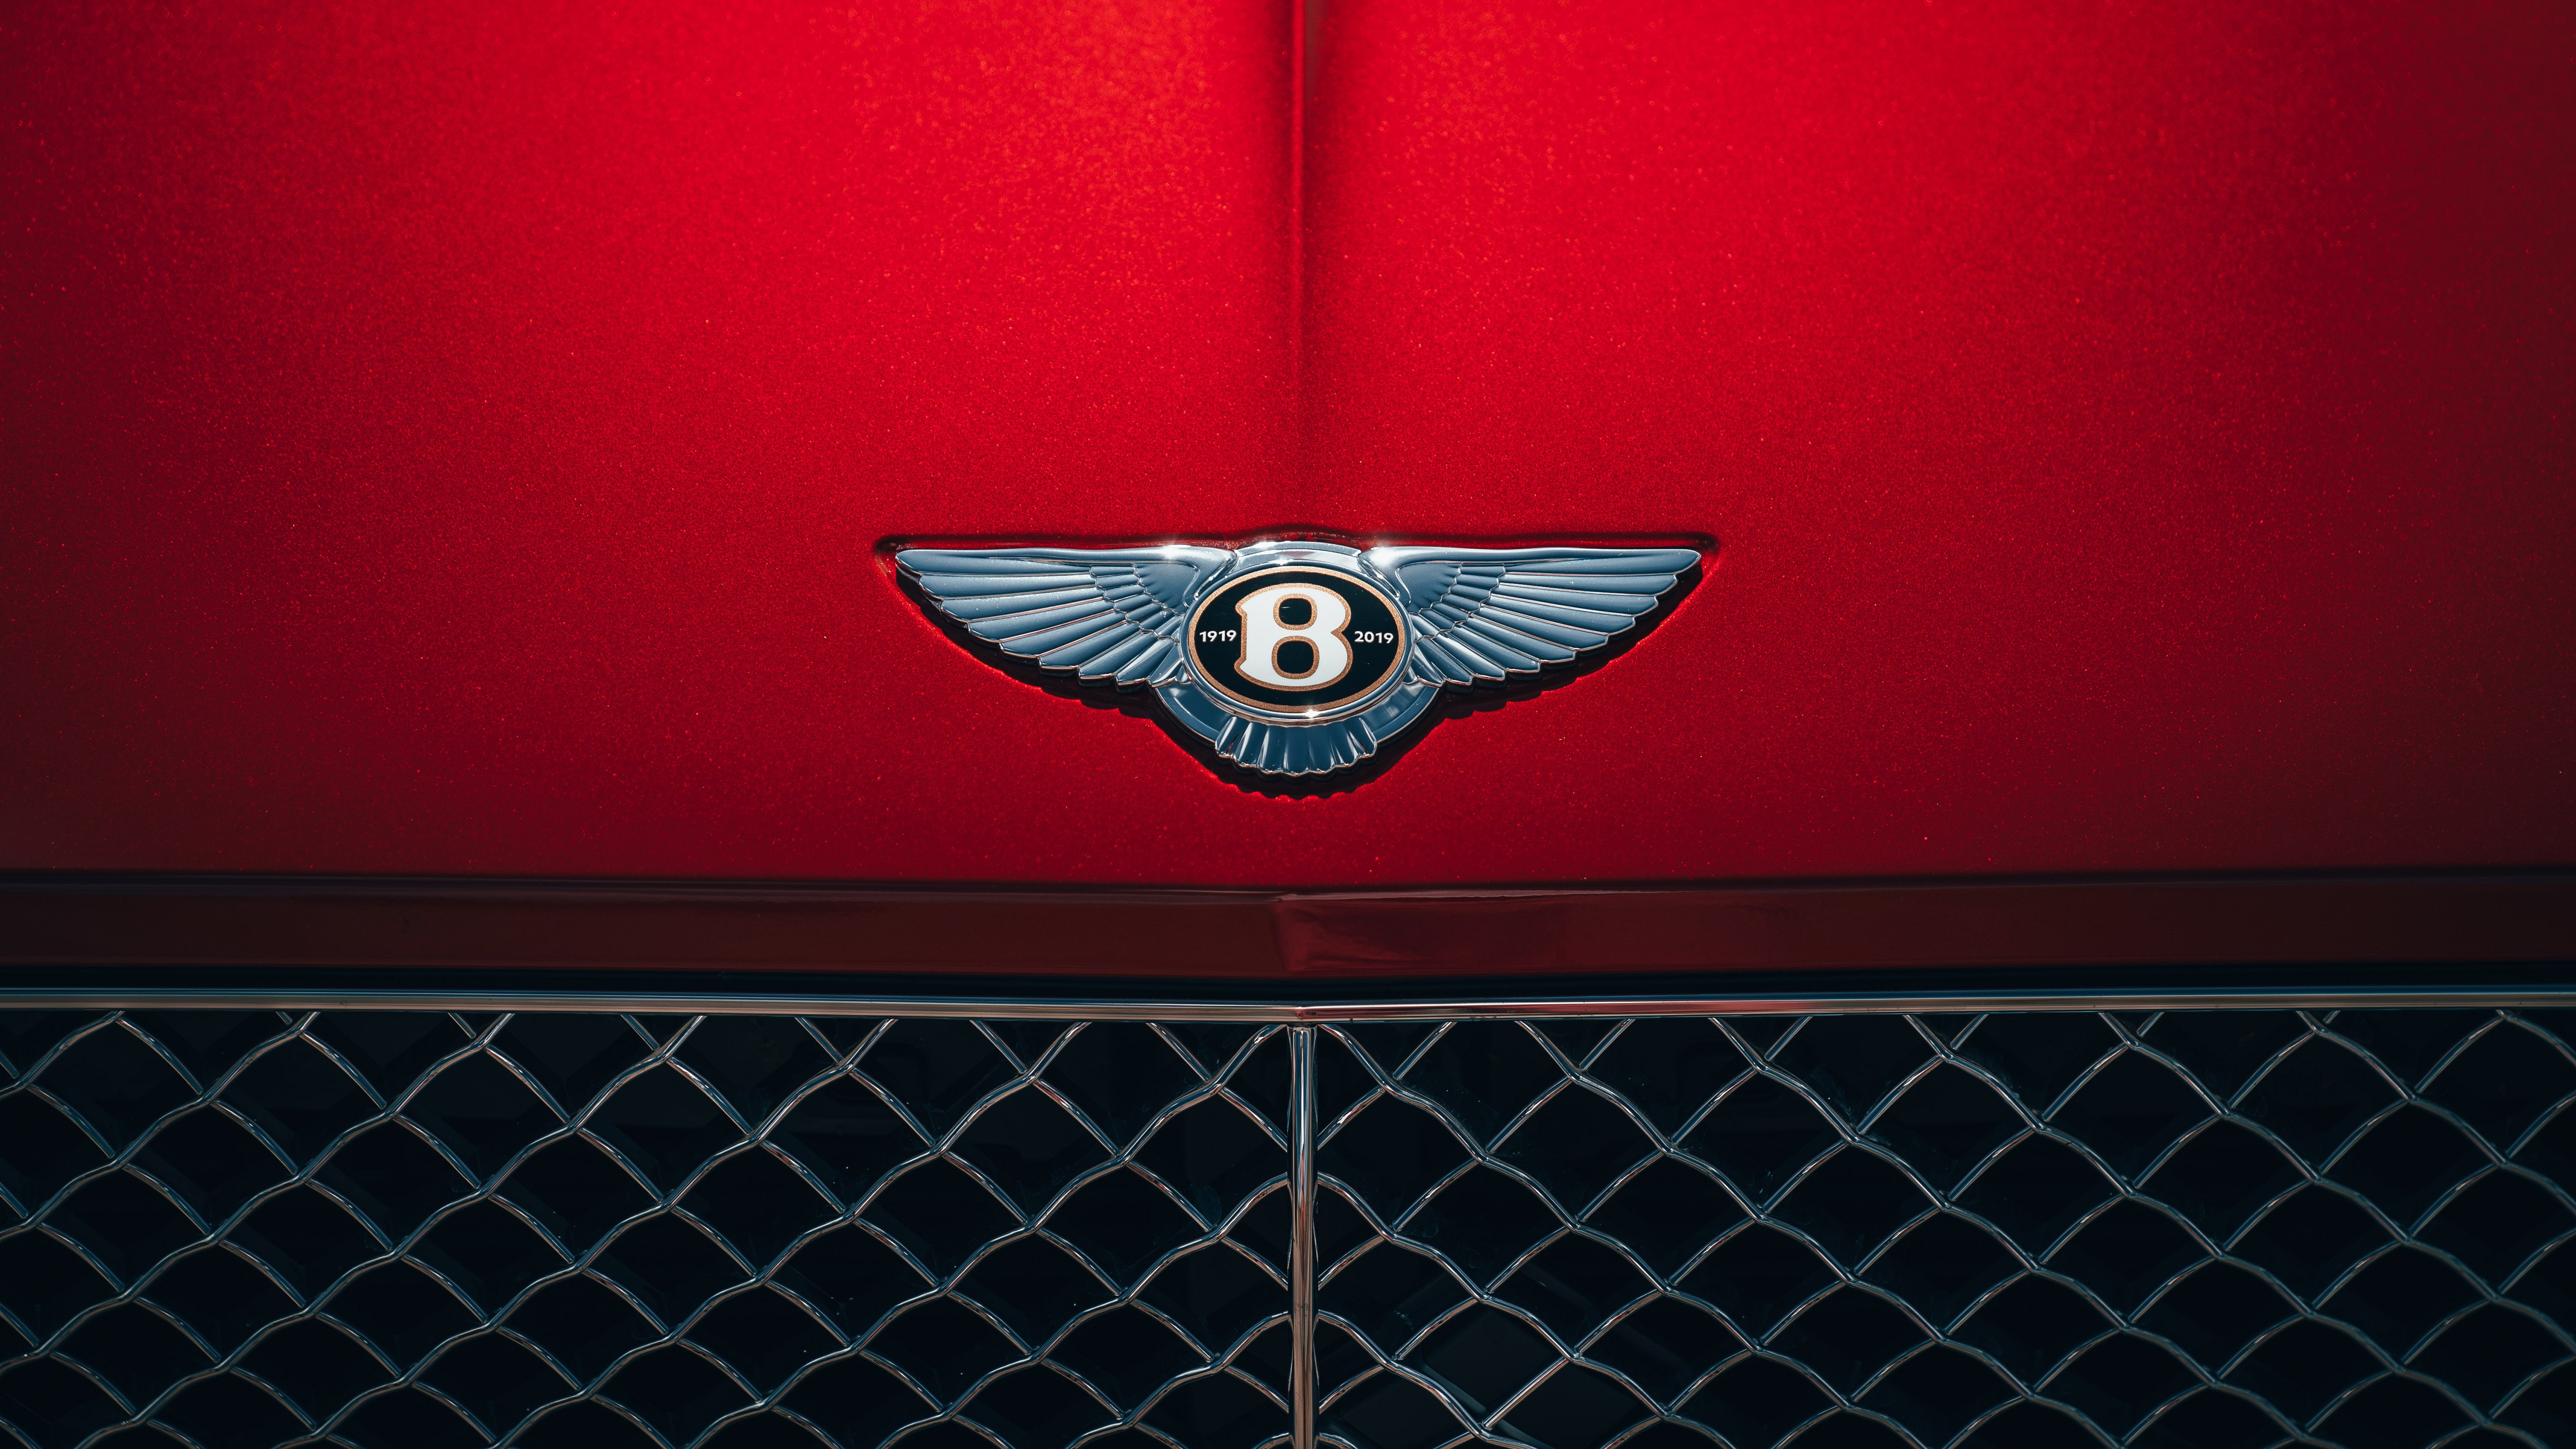 2020 Bentley Logo Wallpaper   HD Car Wallpapers   ID #12770